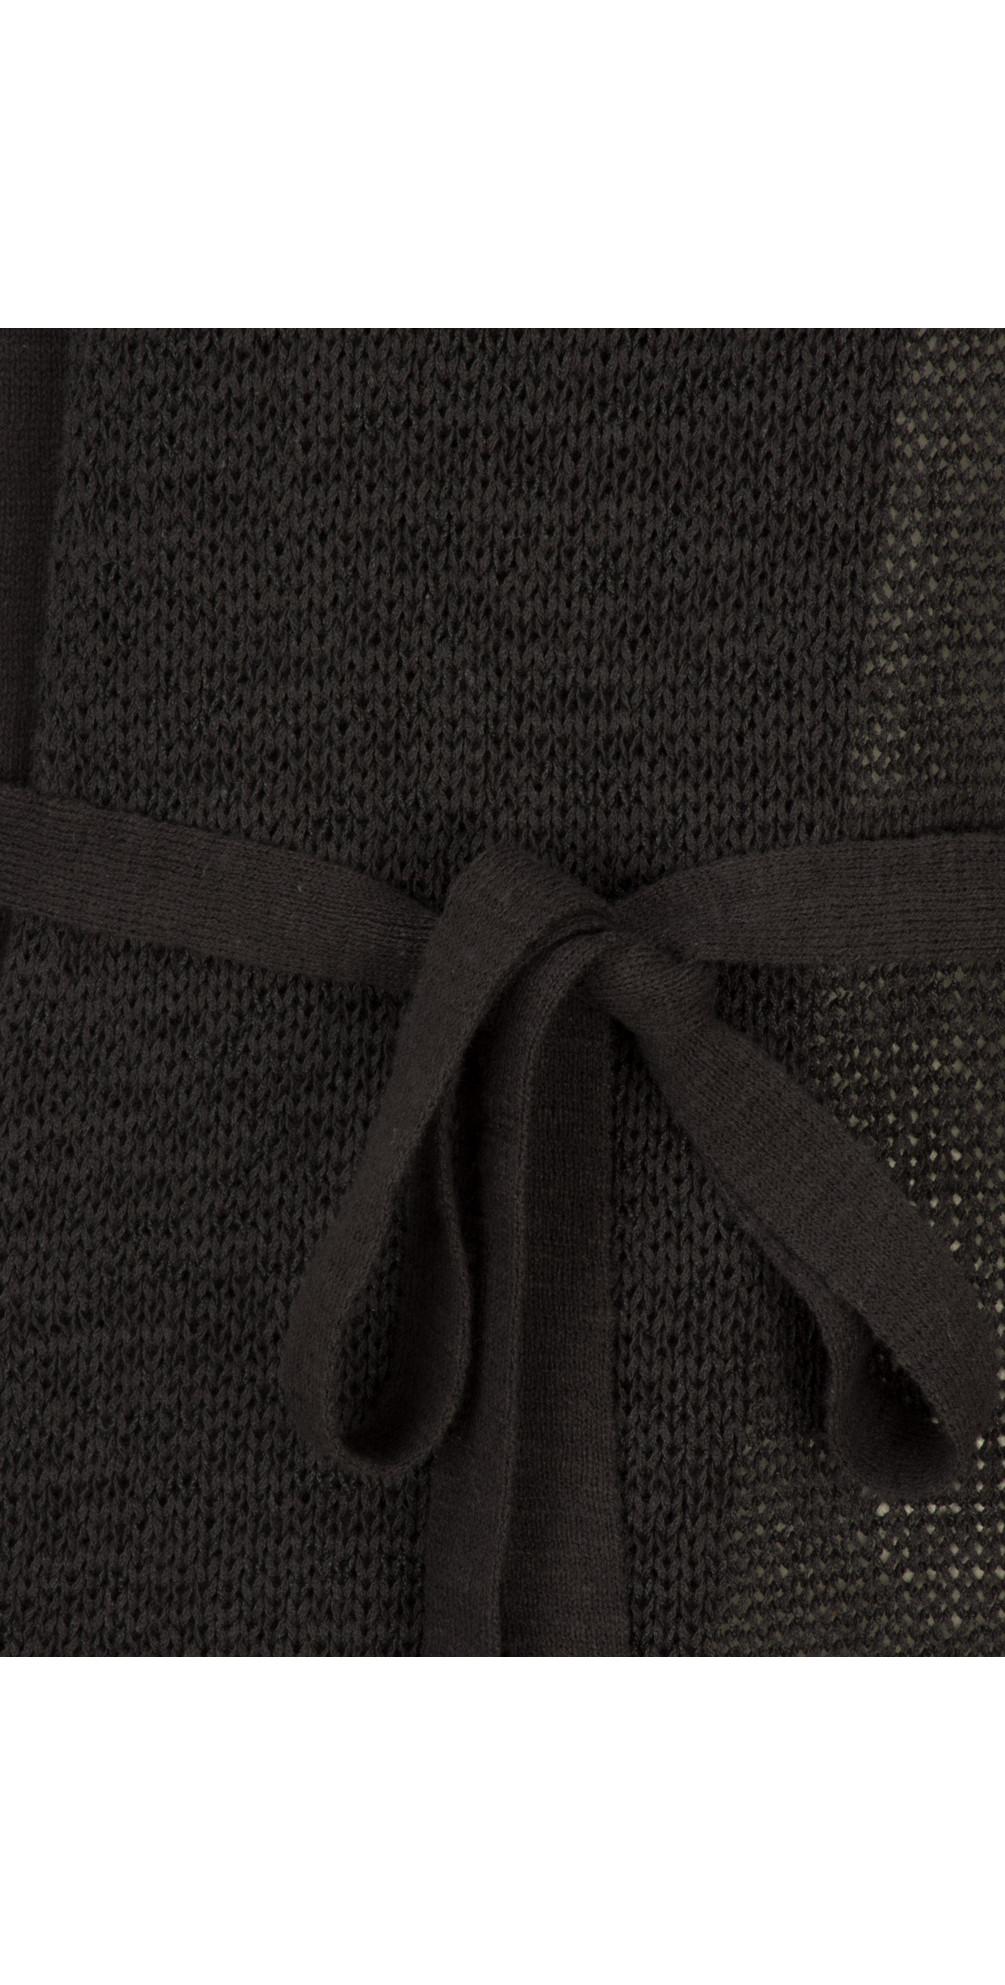 Woven Sleeveless Top With Waist Tie main image